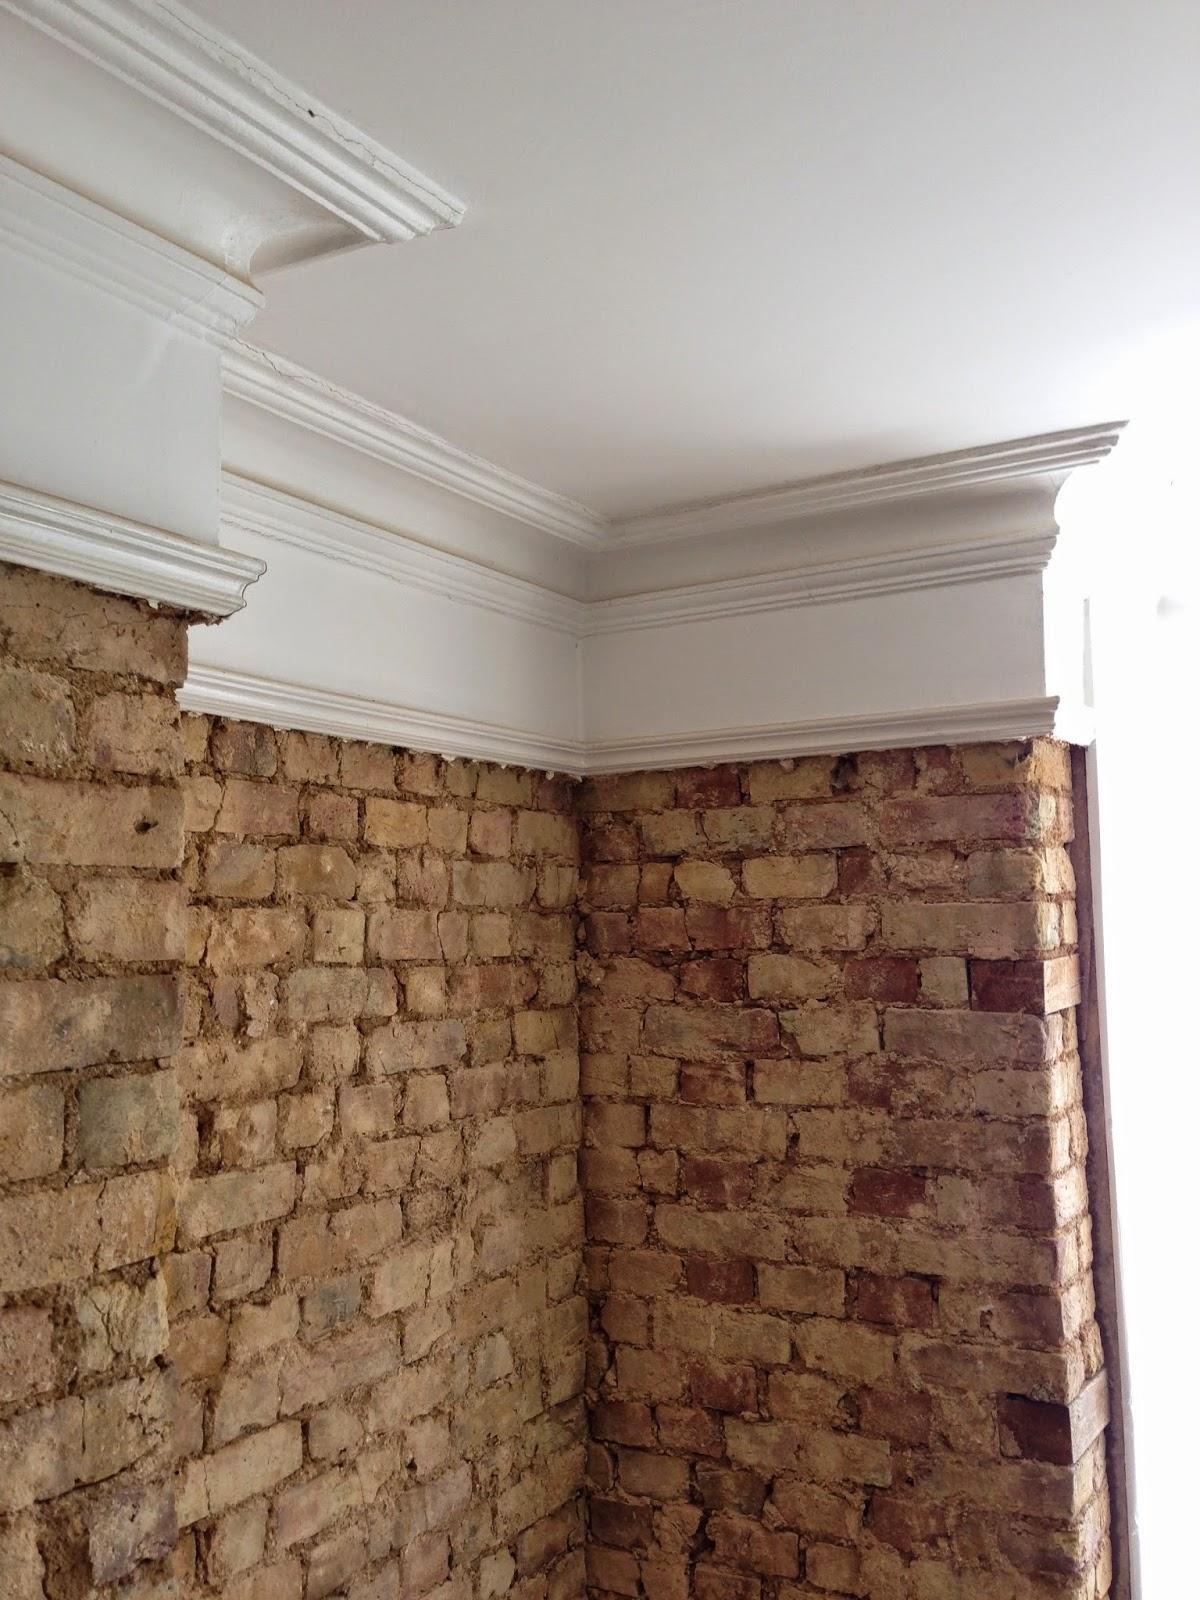 david dangerous original victorian coving and picture rail. Black Bedroom Furniture Sets. Home Design Ideas